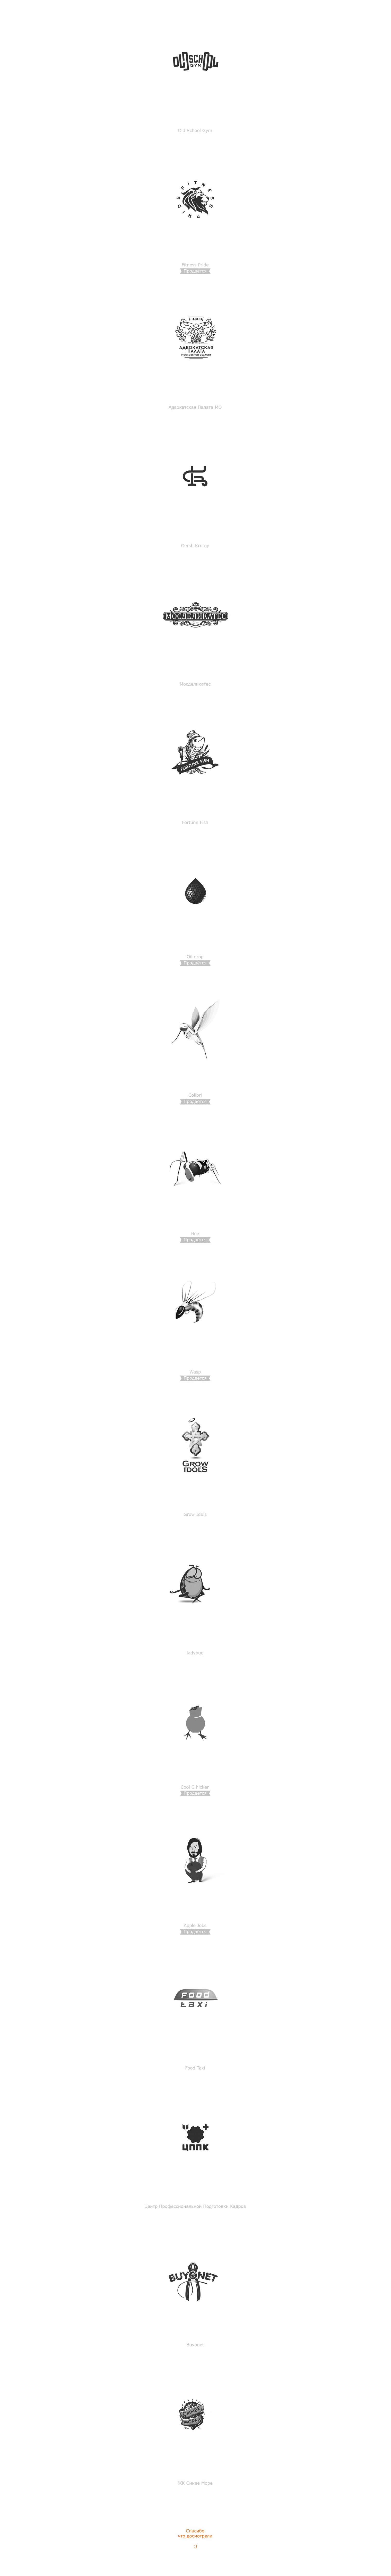 Эмблемы/логотипы